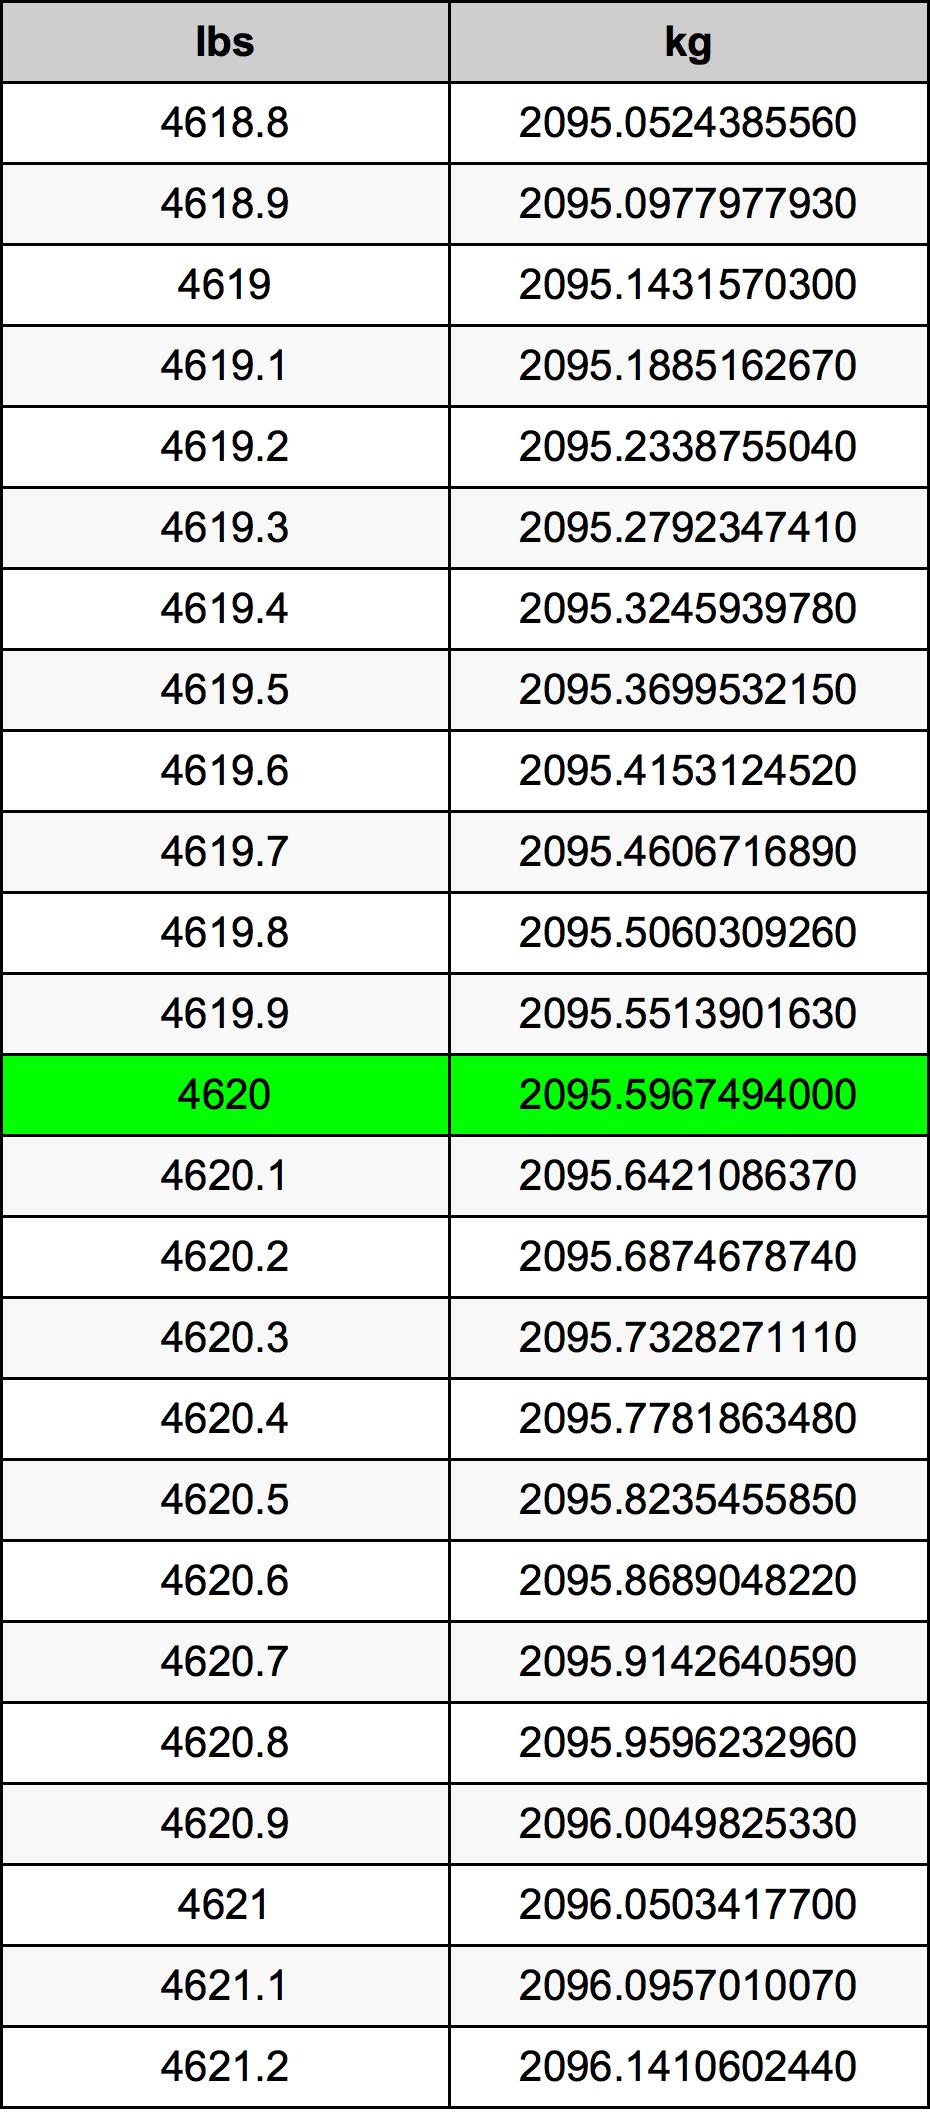 4620 Libra konverteringstabellen